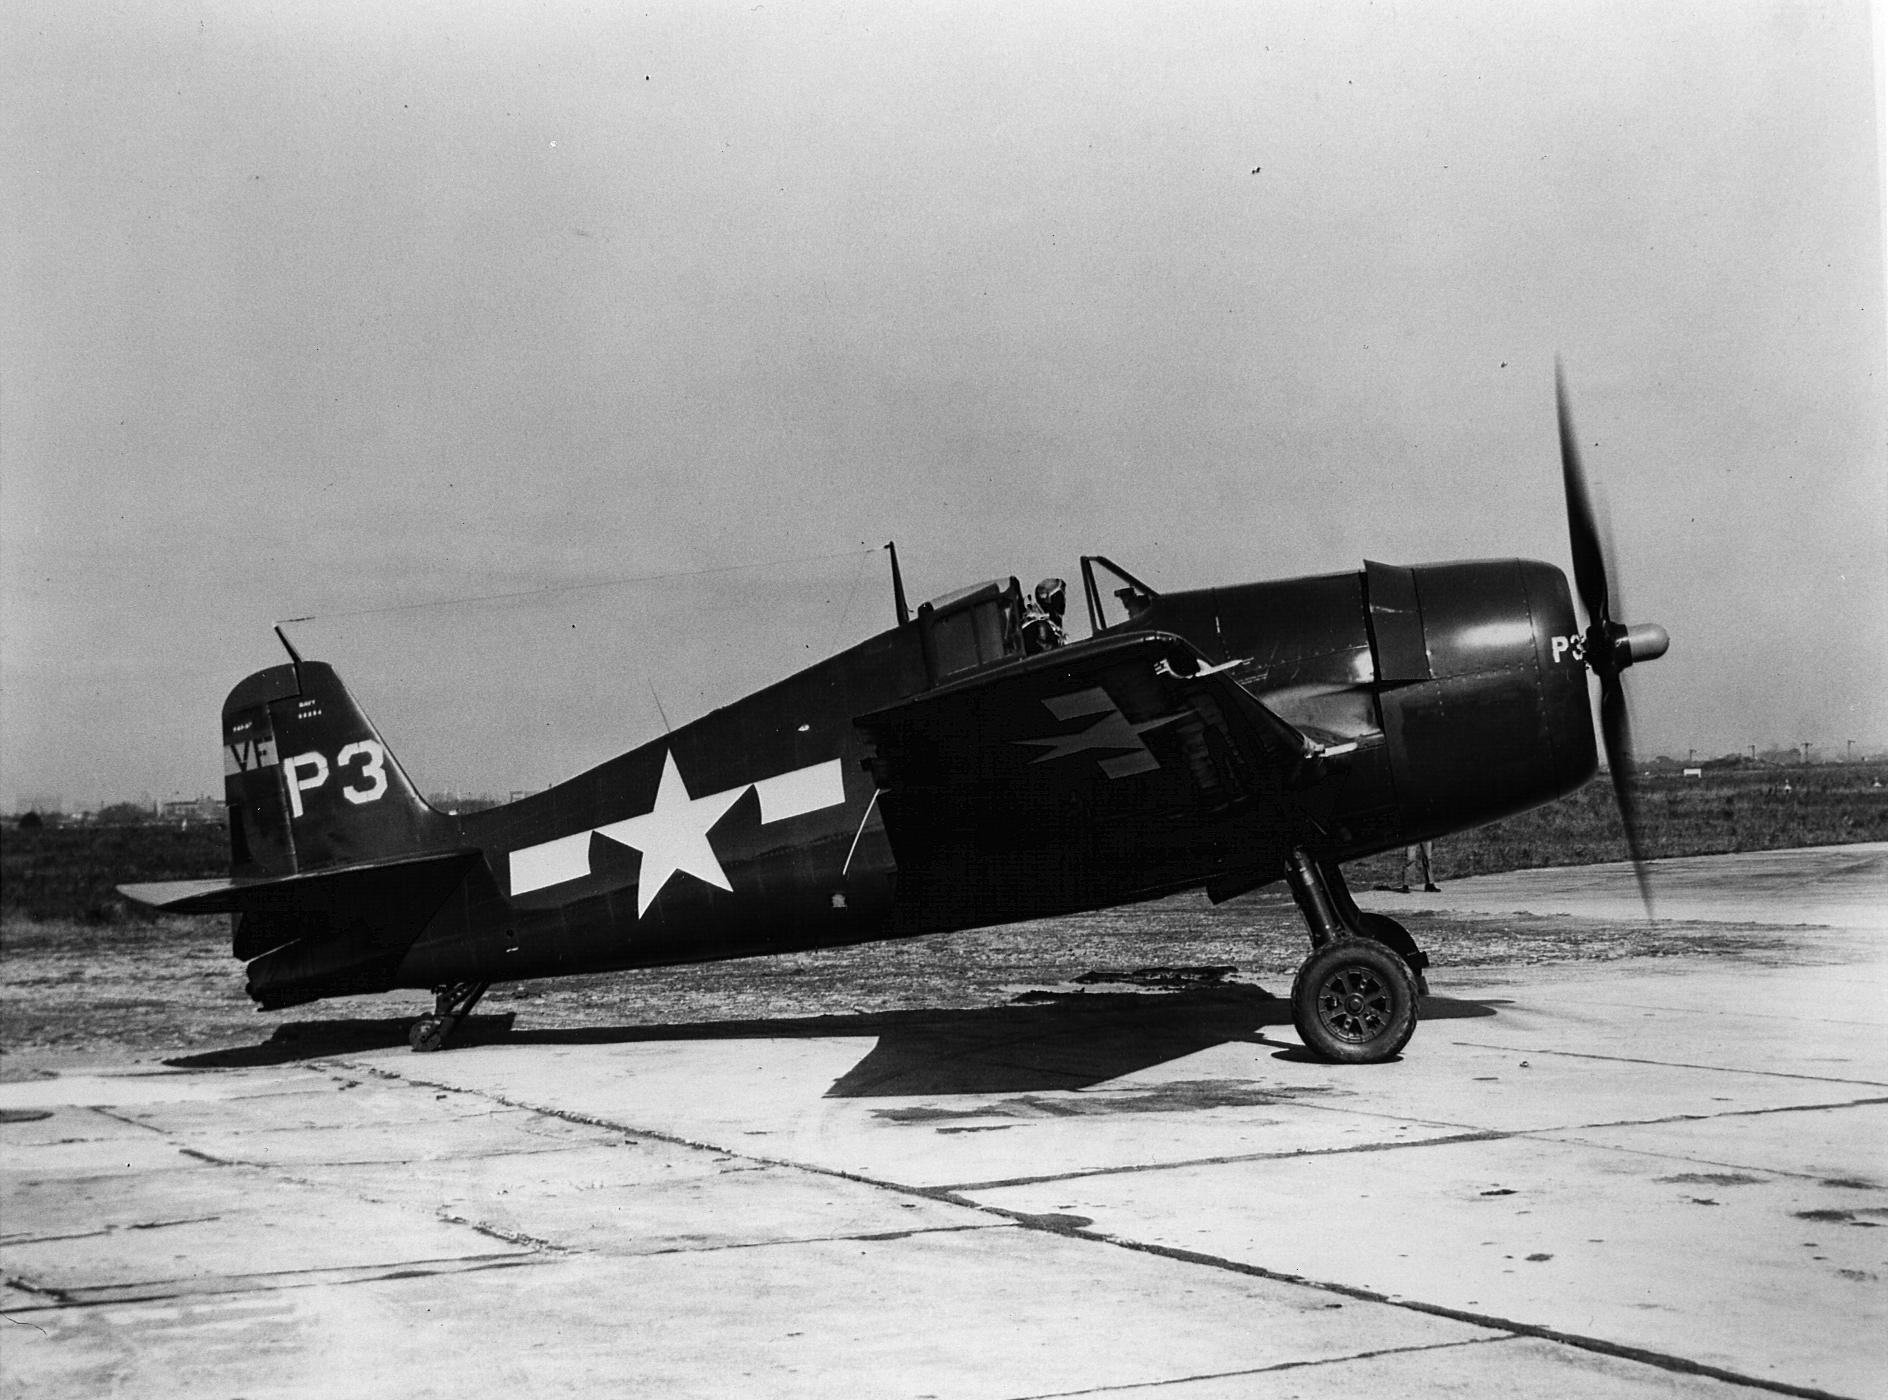 Grumman F6F 5P Hellcat VF 75 White P3 taxing 01